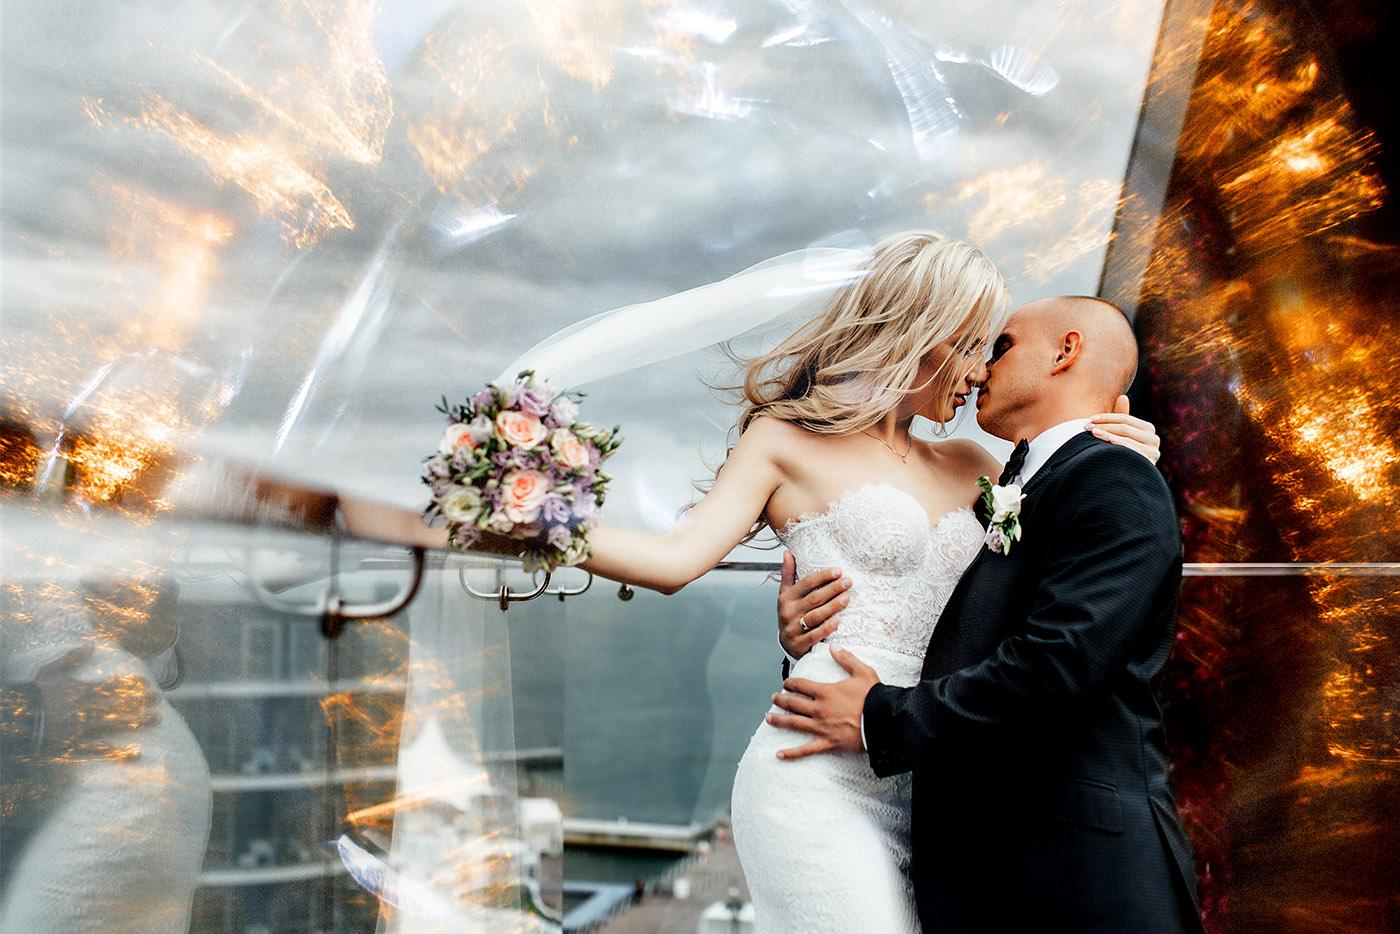 1200+ Wedding Bundle PS   LR items - 33 -